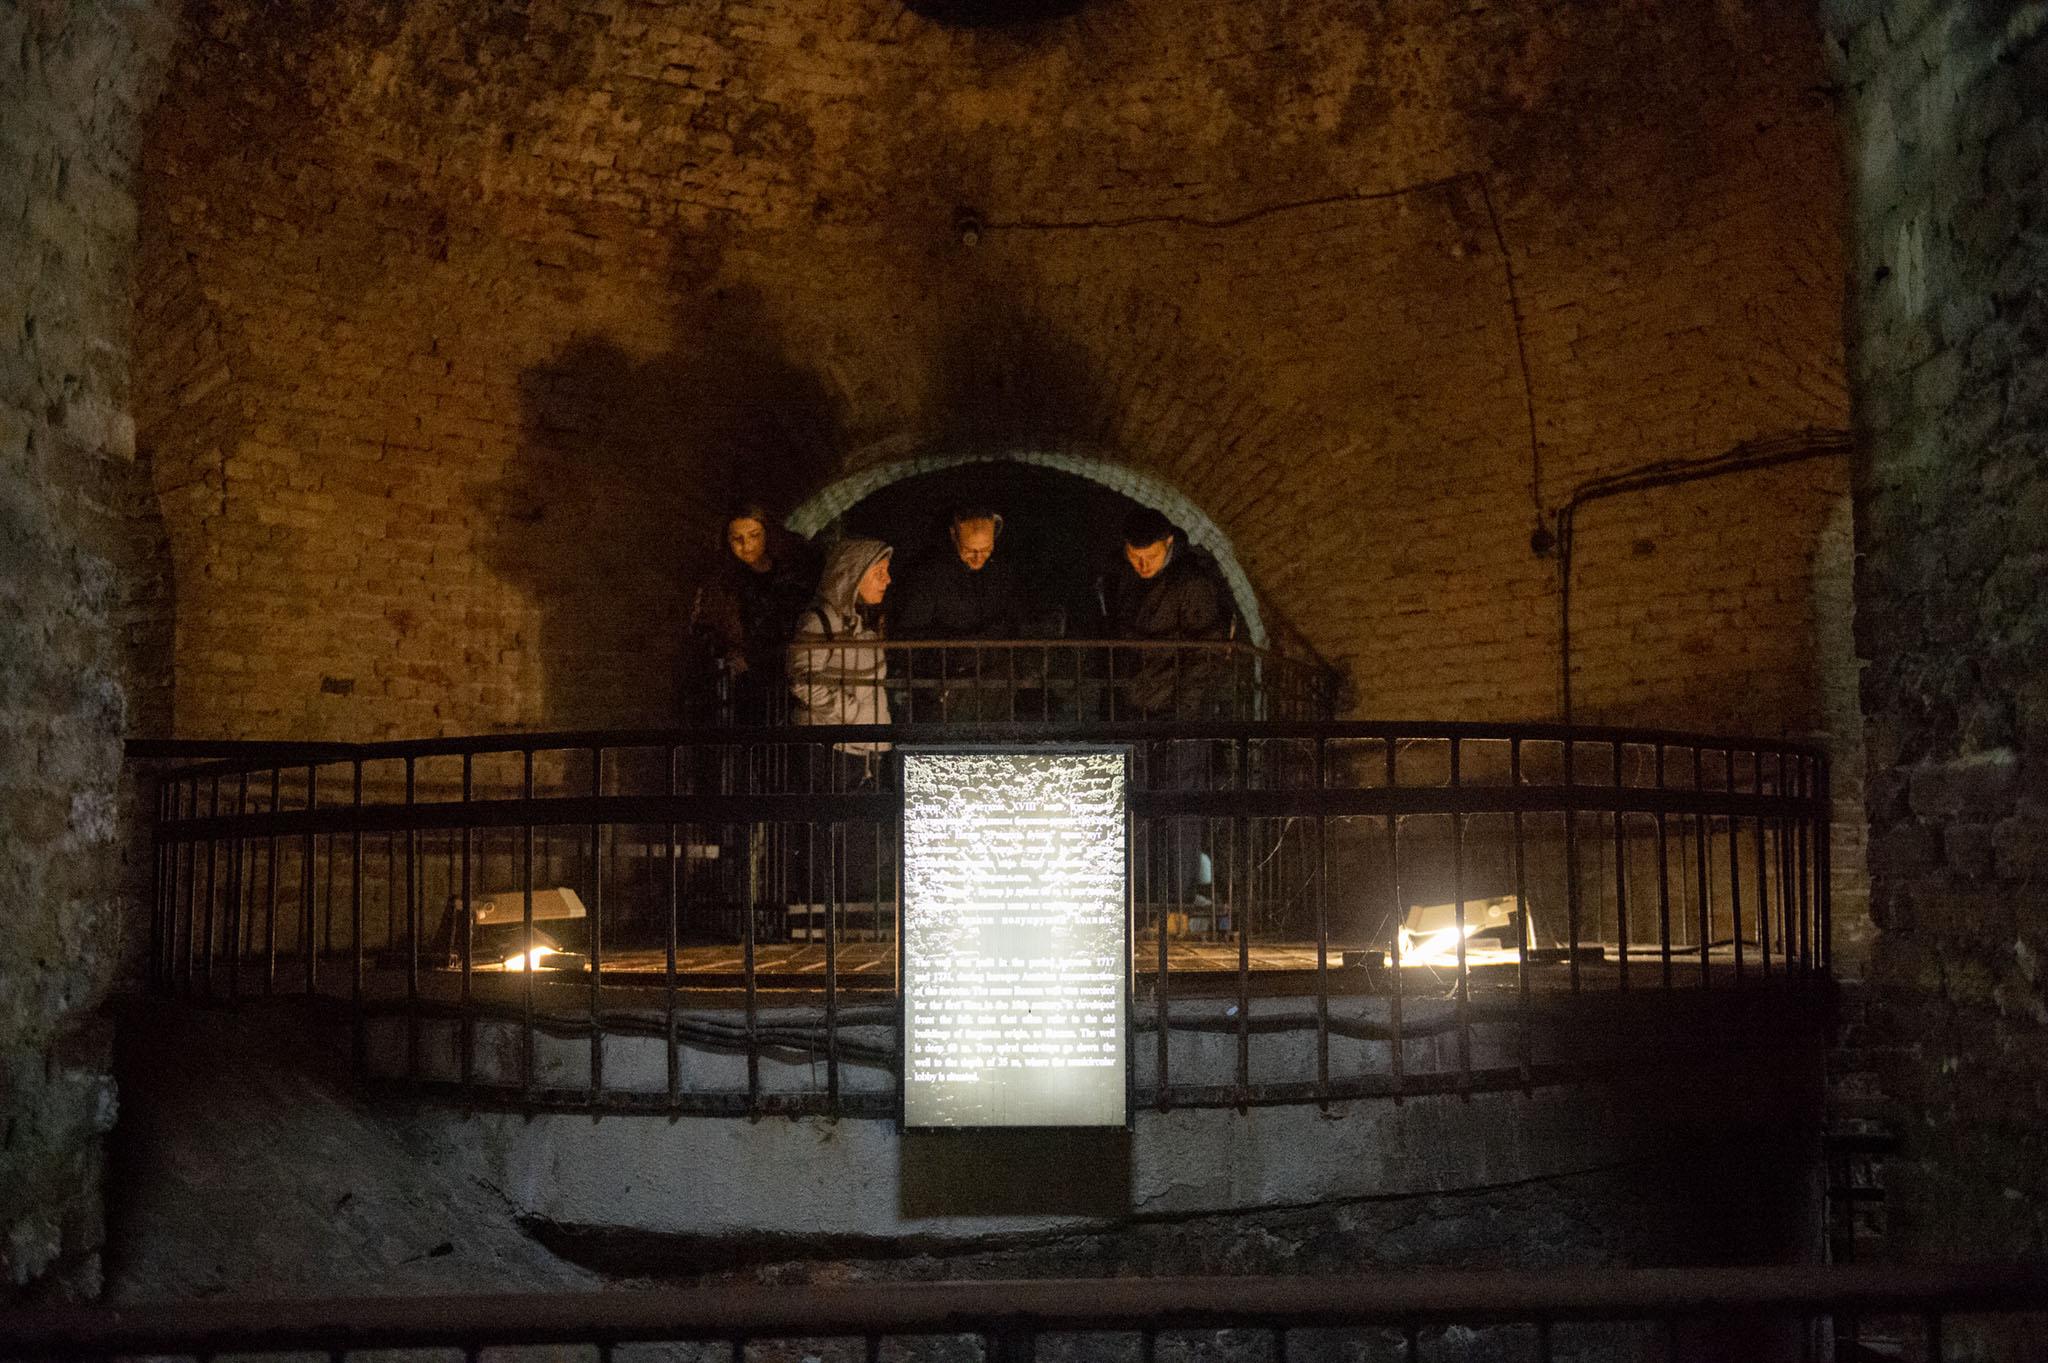 Rimski bunar, Beograd ispod Beograda